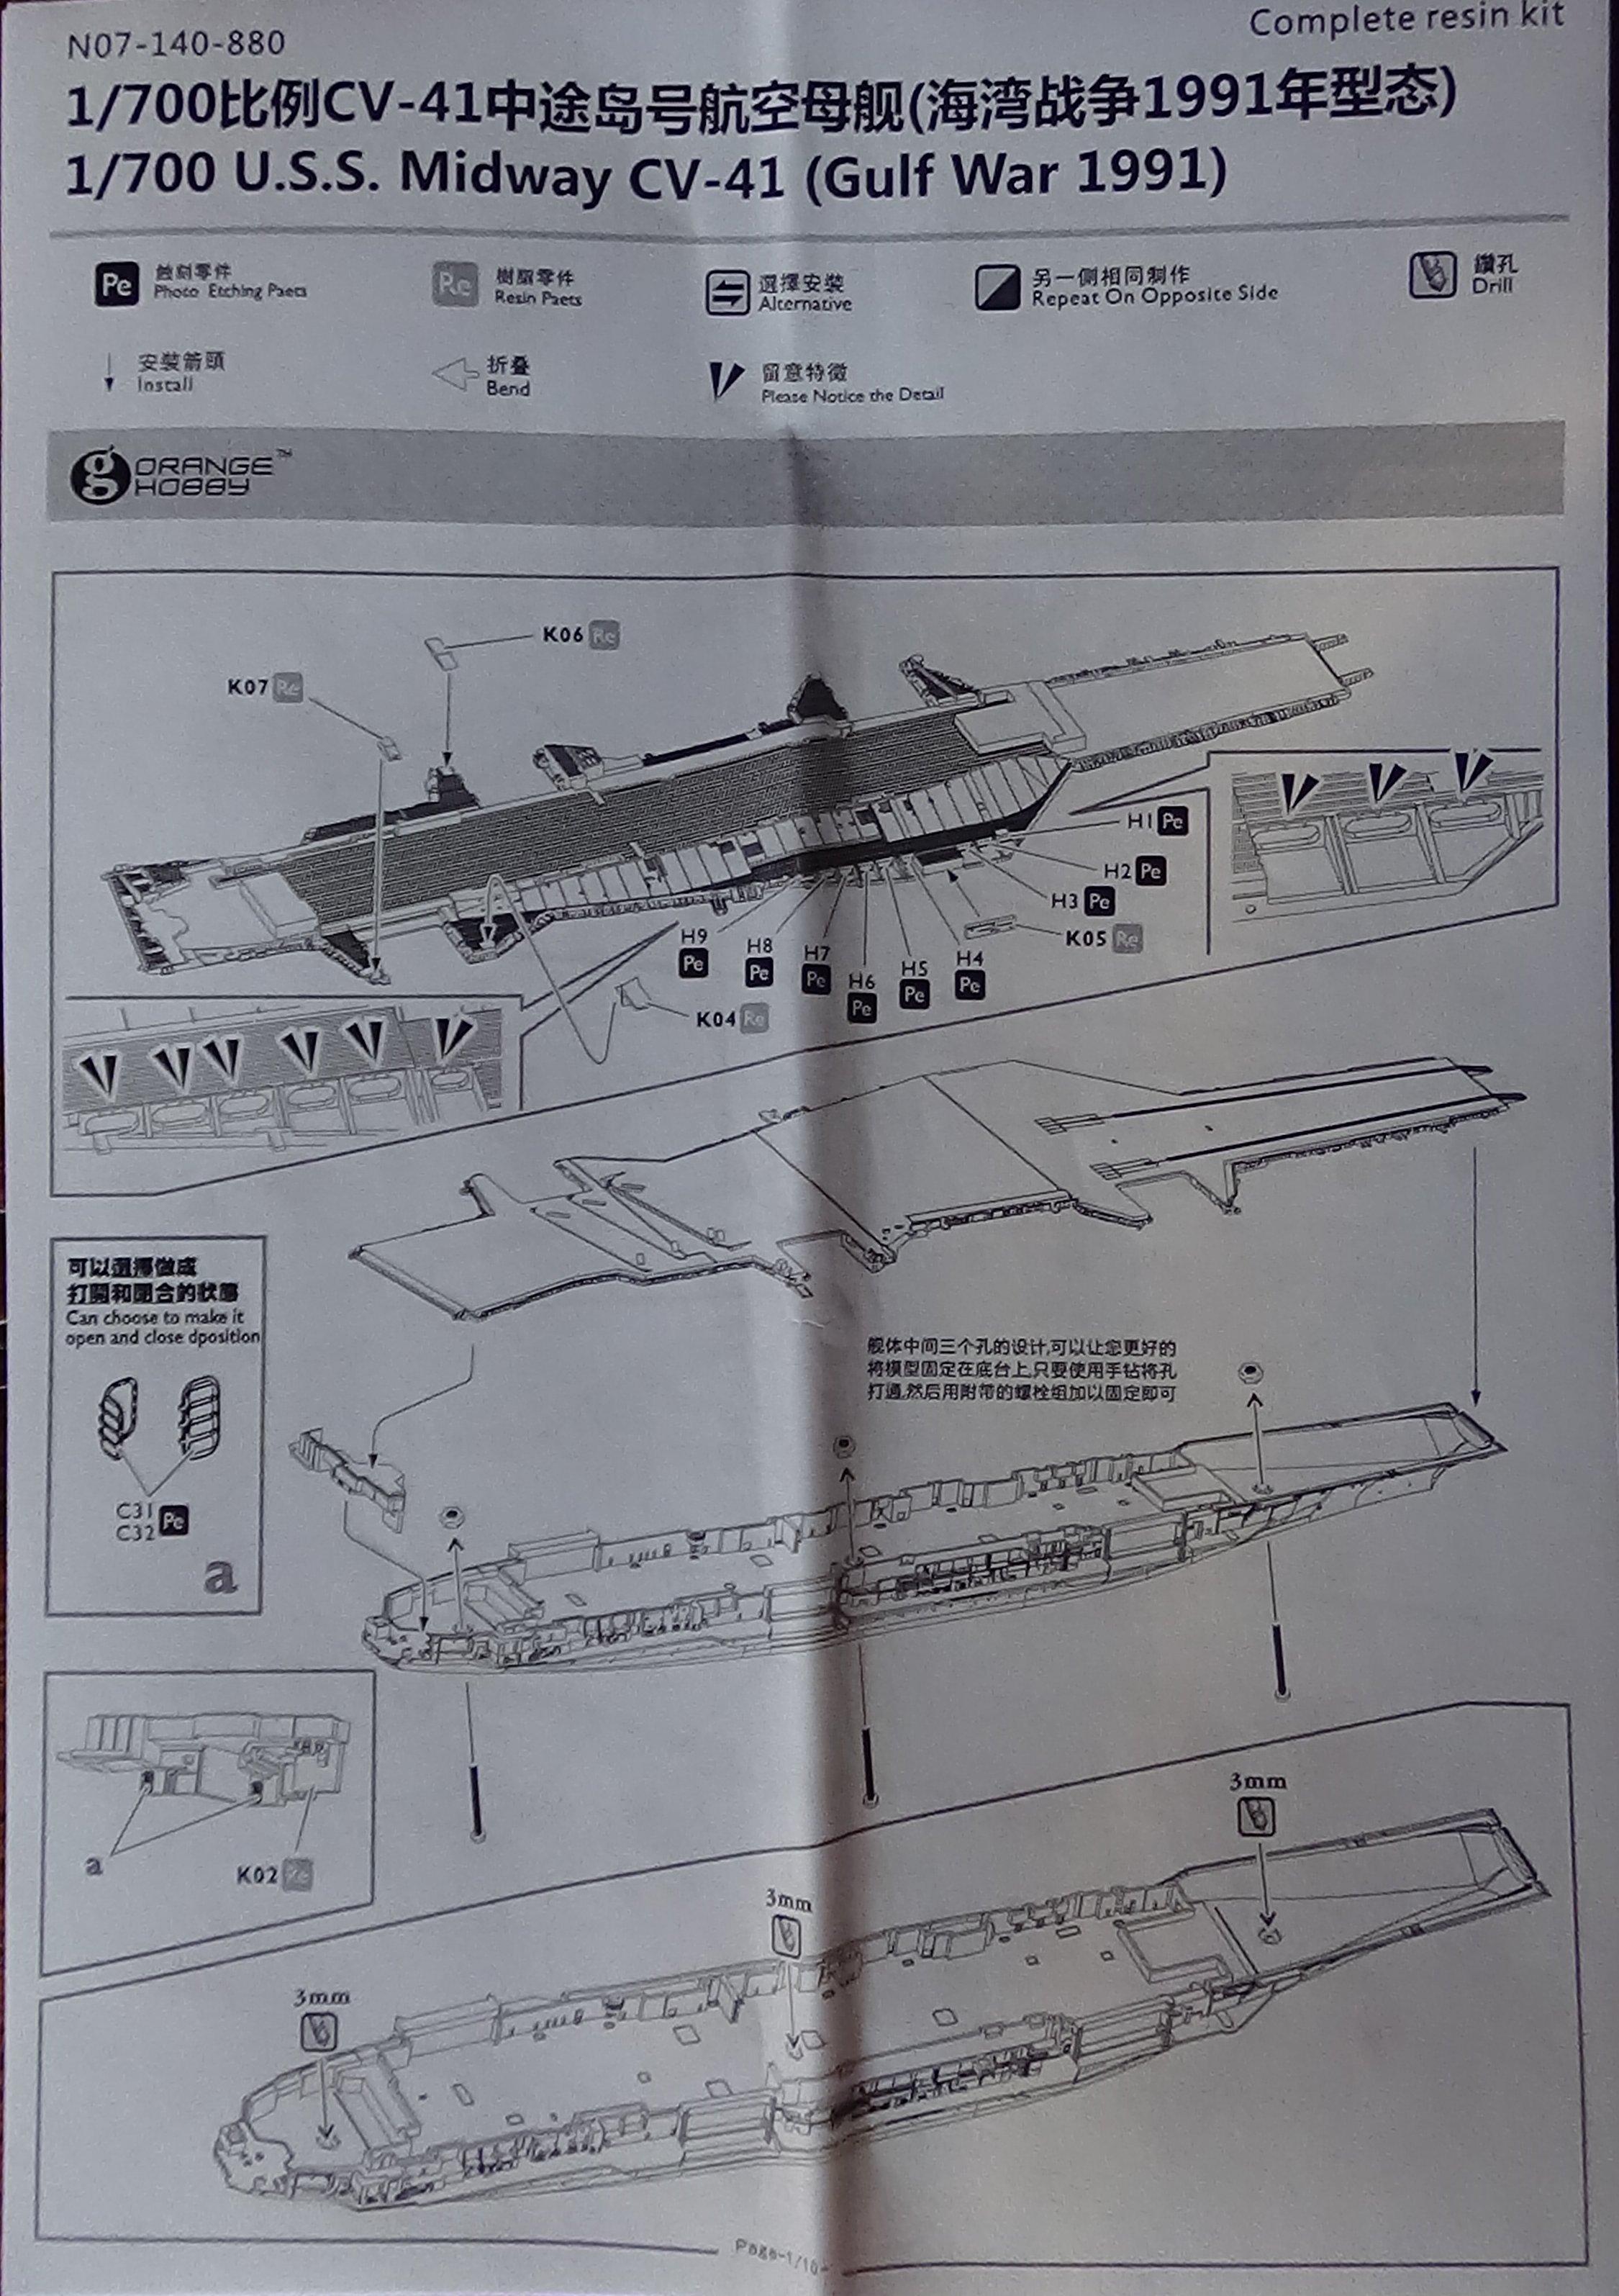 [USS Midway CVA-41] Porte avions lourd américain-700e-Orange Hobby 17071905070423134915156014